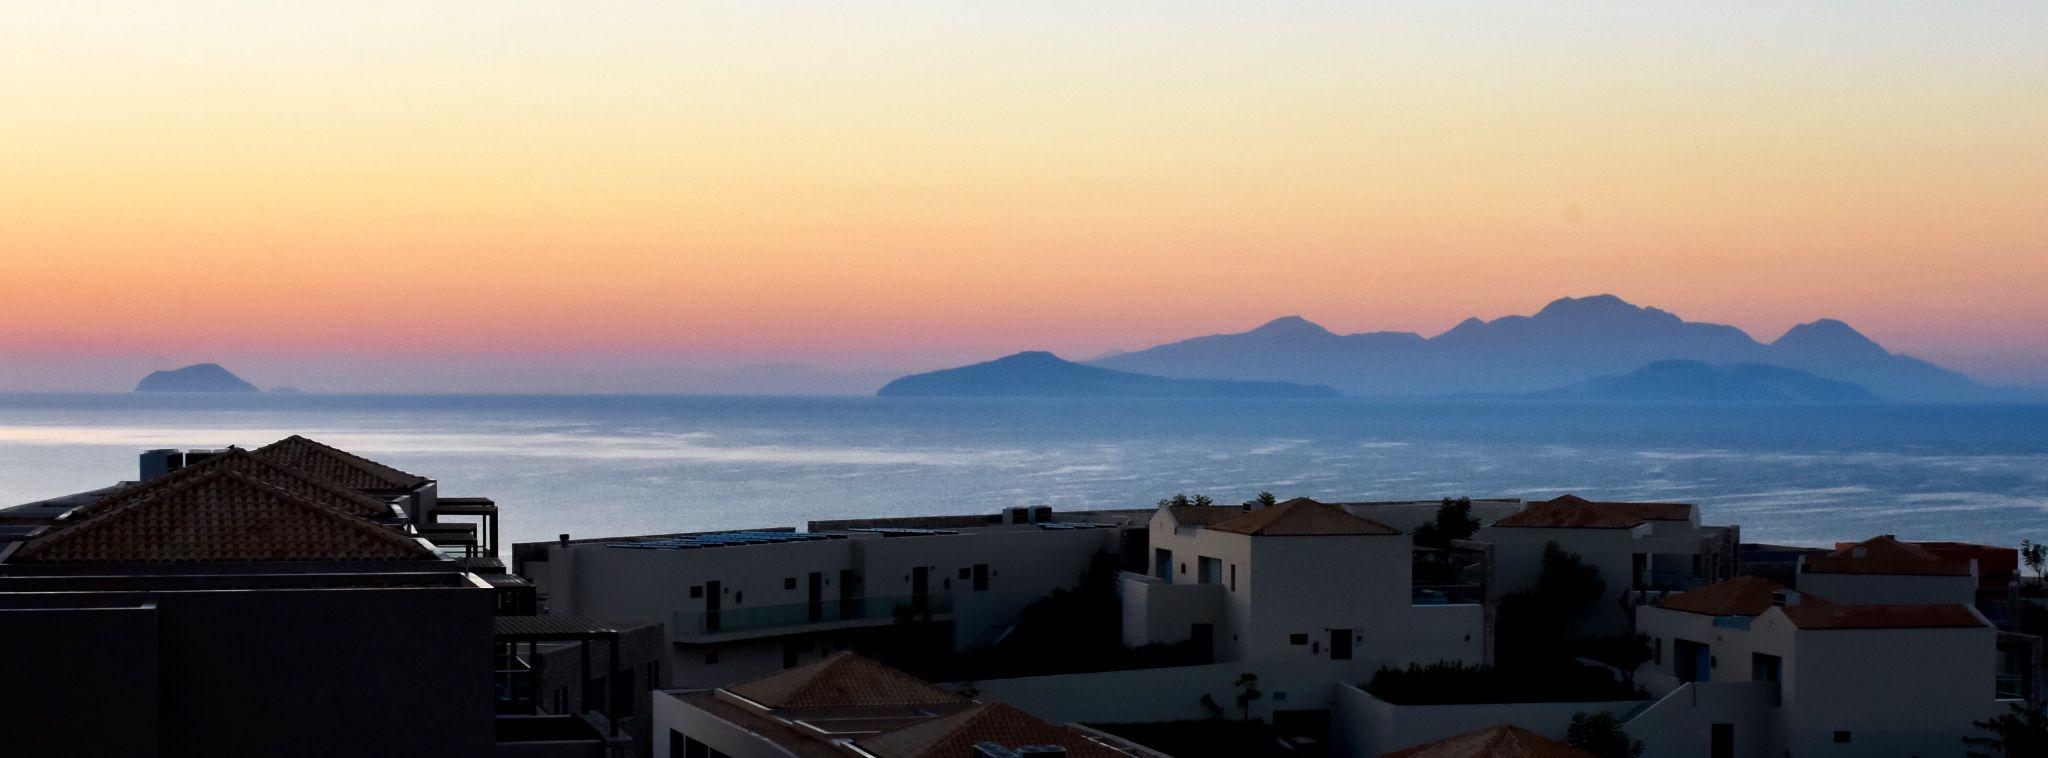 Sunrise on the mediterranean, Greece